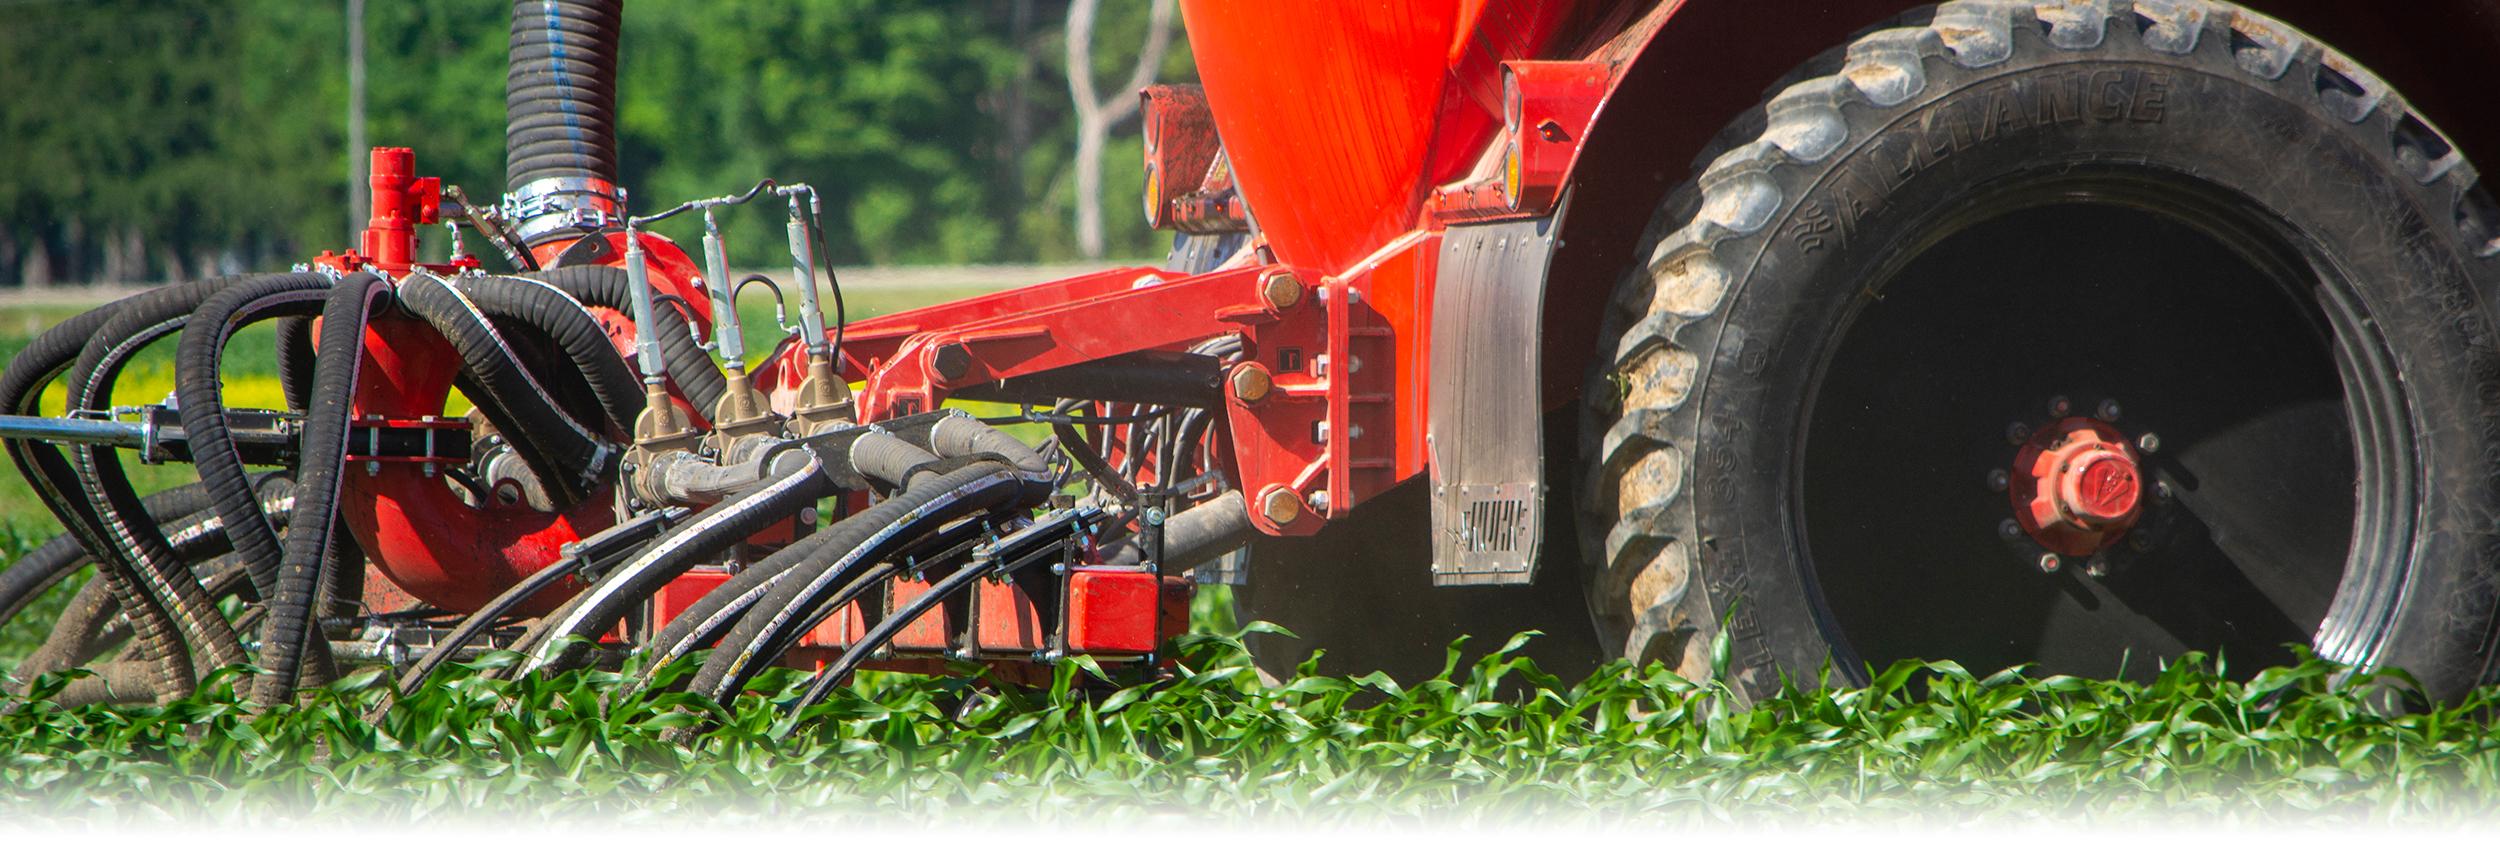 row-crop-injector-tractor2